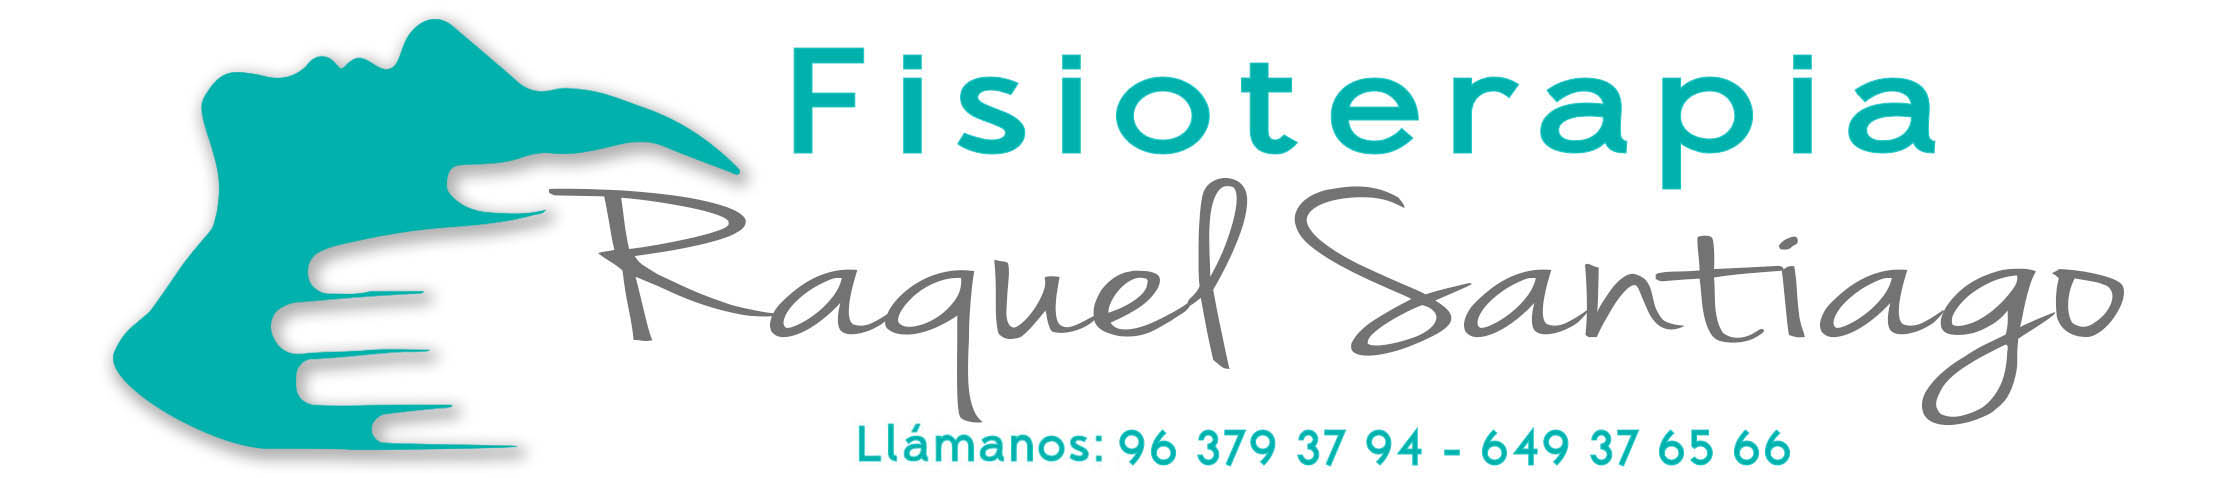 Fisioterapia Xirivella logo